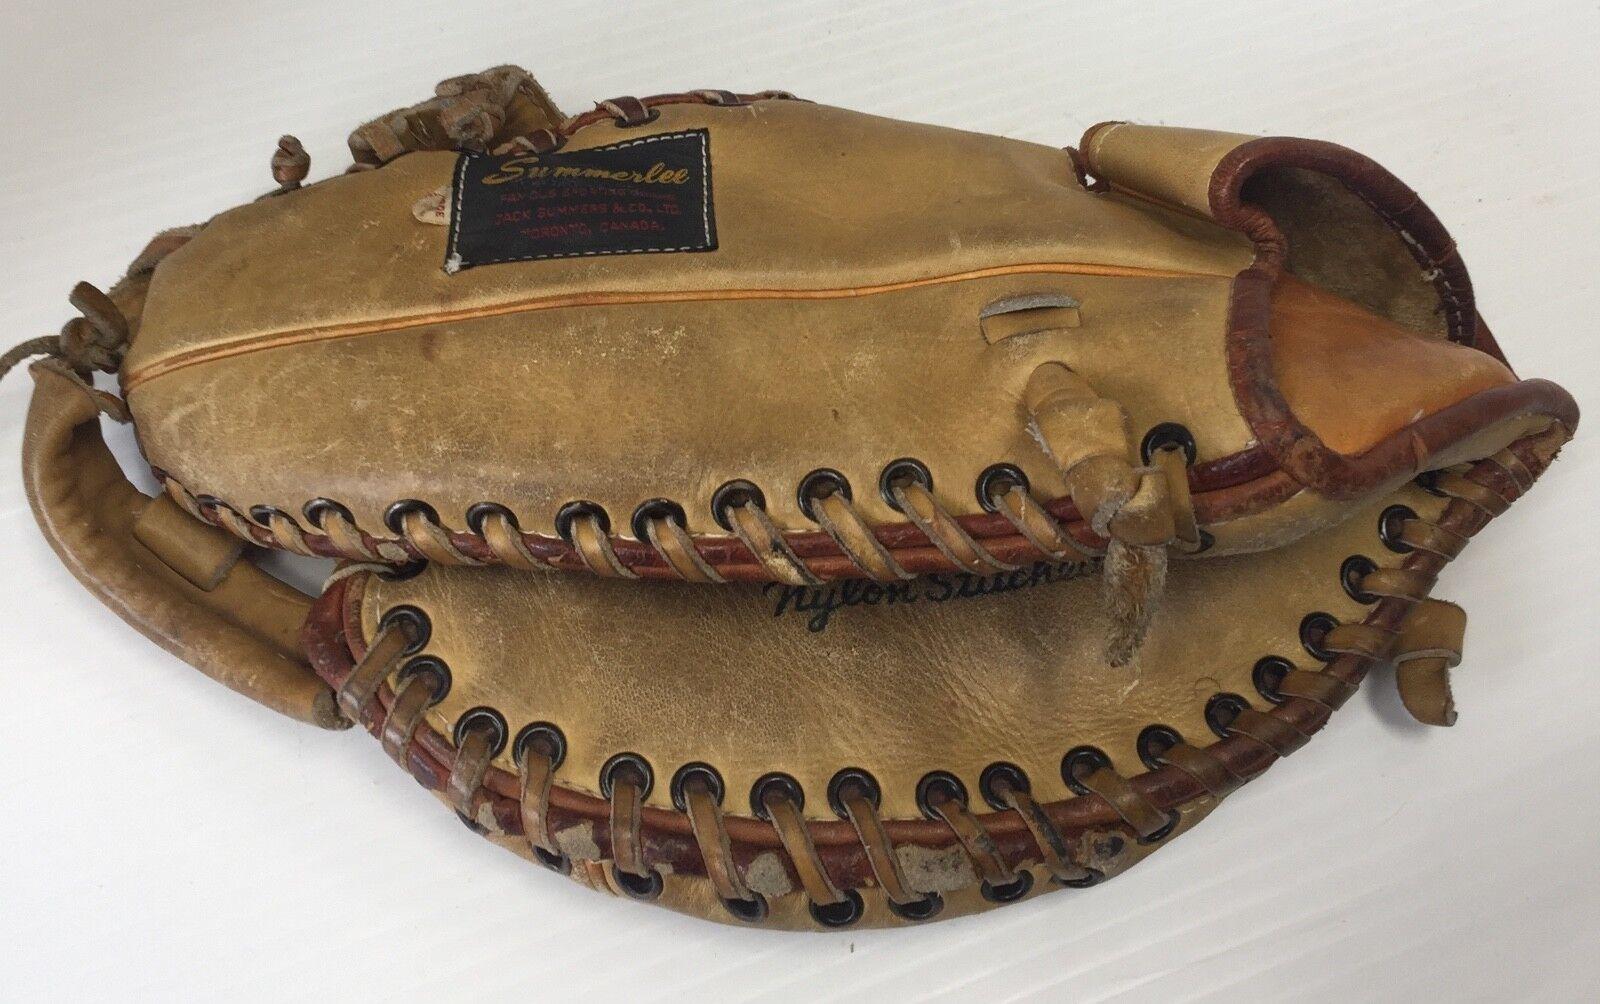 Modelo Vintage Summerlee base SW-285 pro primera base Summerlee Guante de béisbol LHT Cuero Marrón a804d5